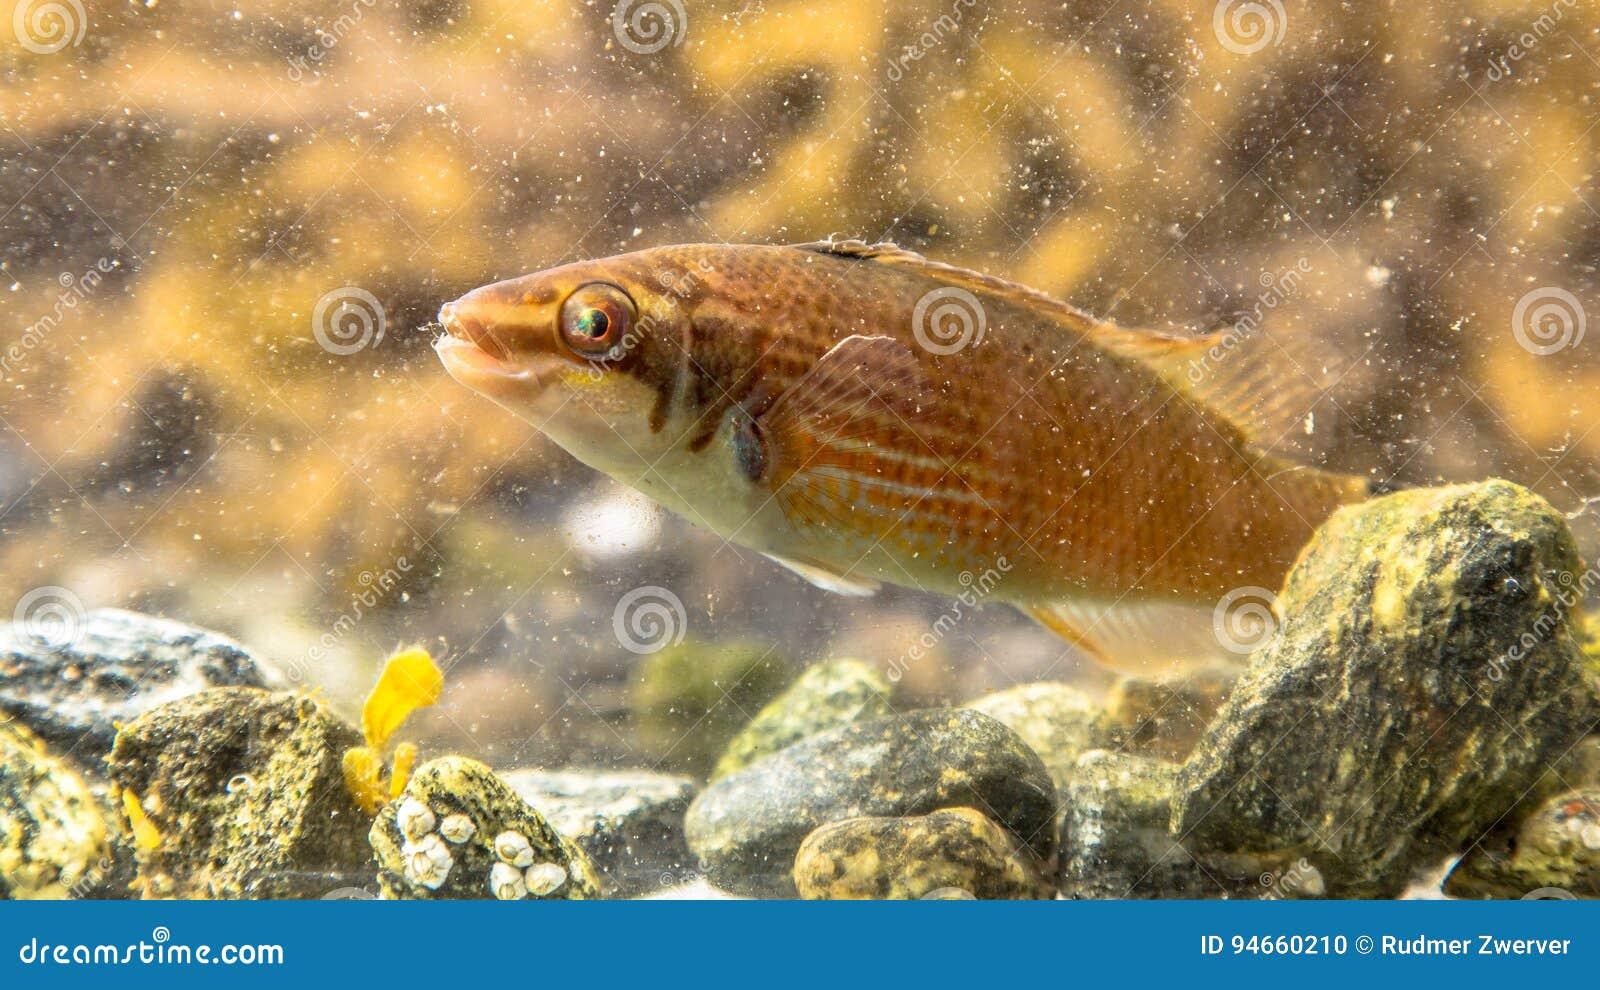 Marine Fish Goldsinny Wrasse Stock Photo Image Of Hobby Fishing 94660210